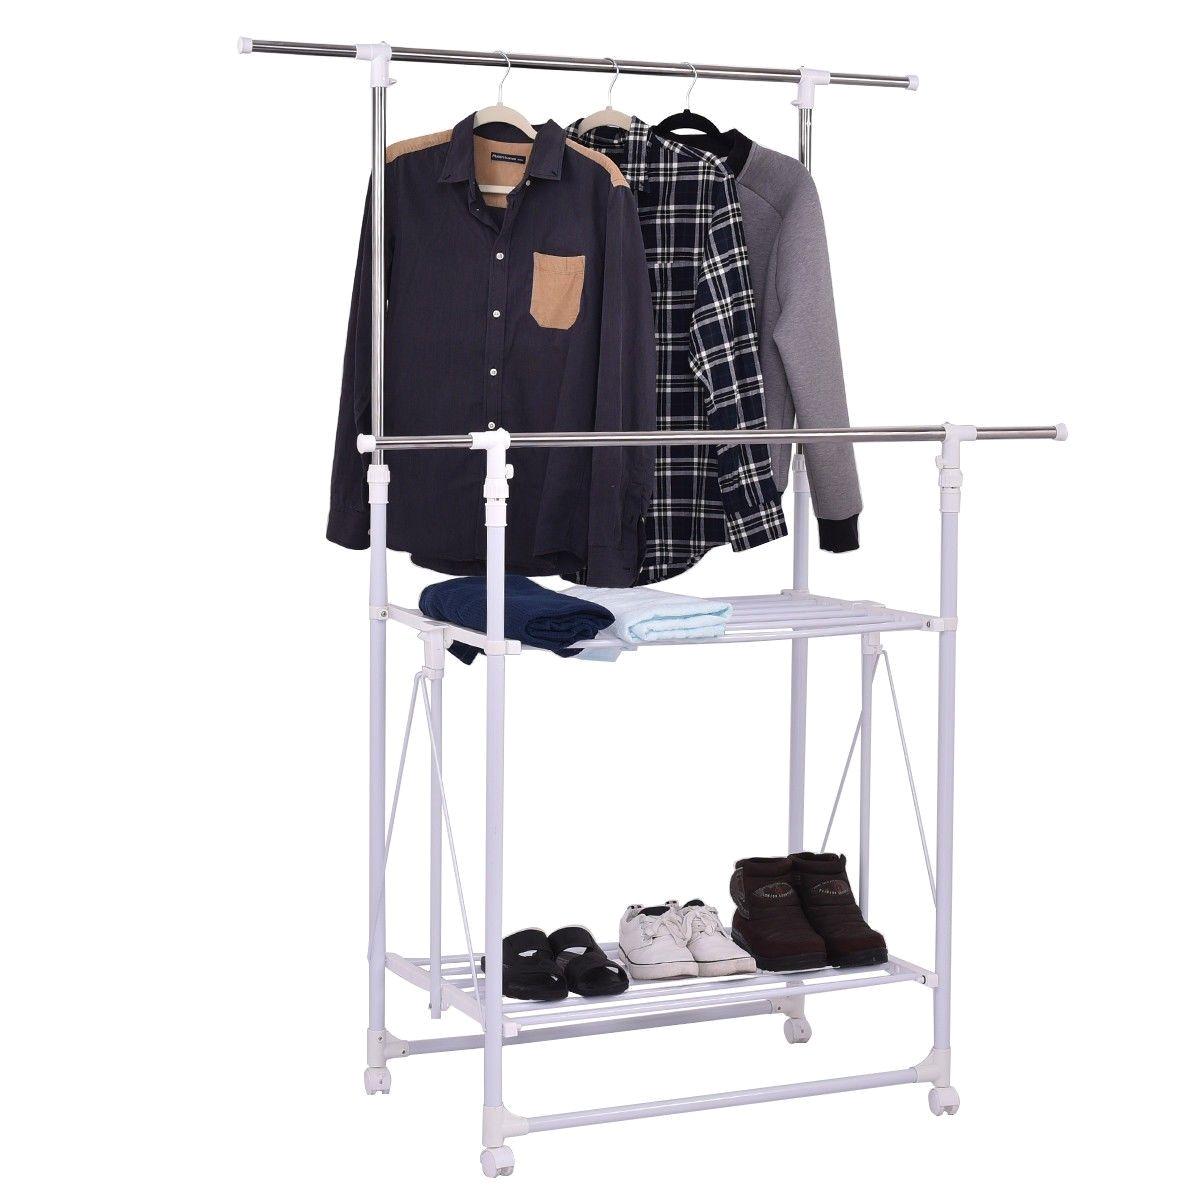 Rolling Clothes Racks Target Double Rail Folding Adjustable Rolling Clothes Rack Hanger W 2